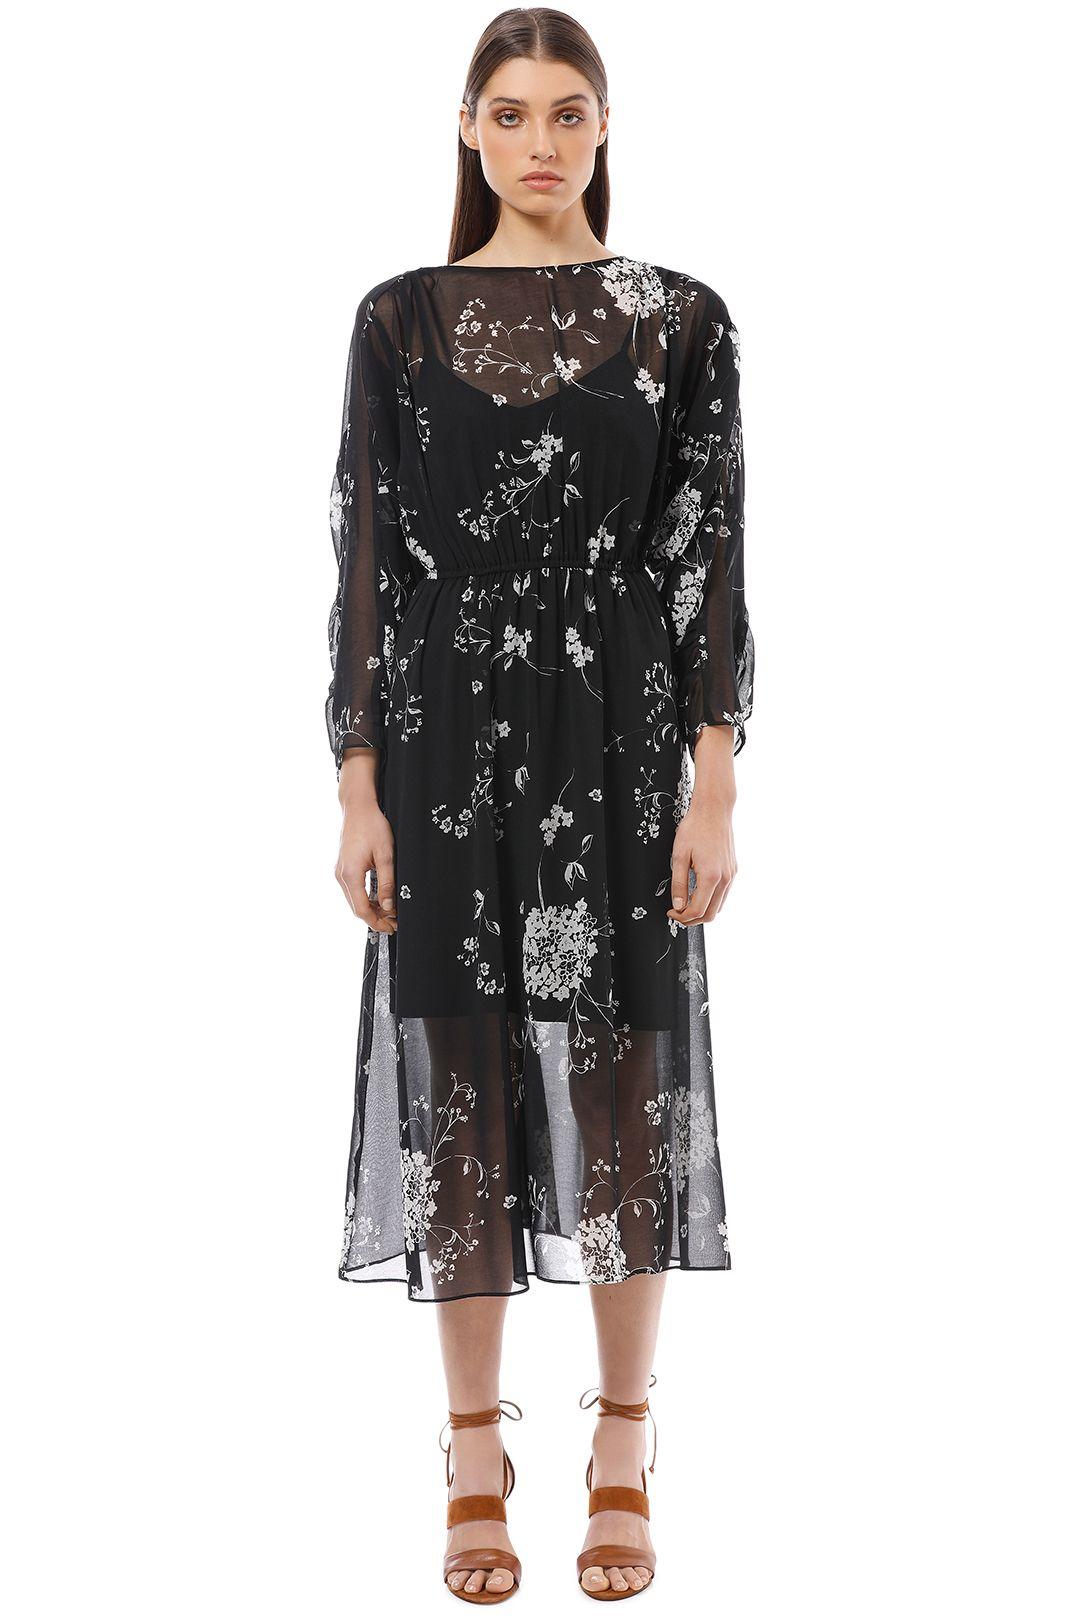 Veronika Maine - Monotone Floral Gathered Midi Dress - Black - Front